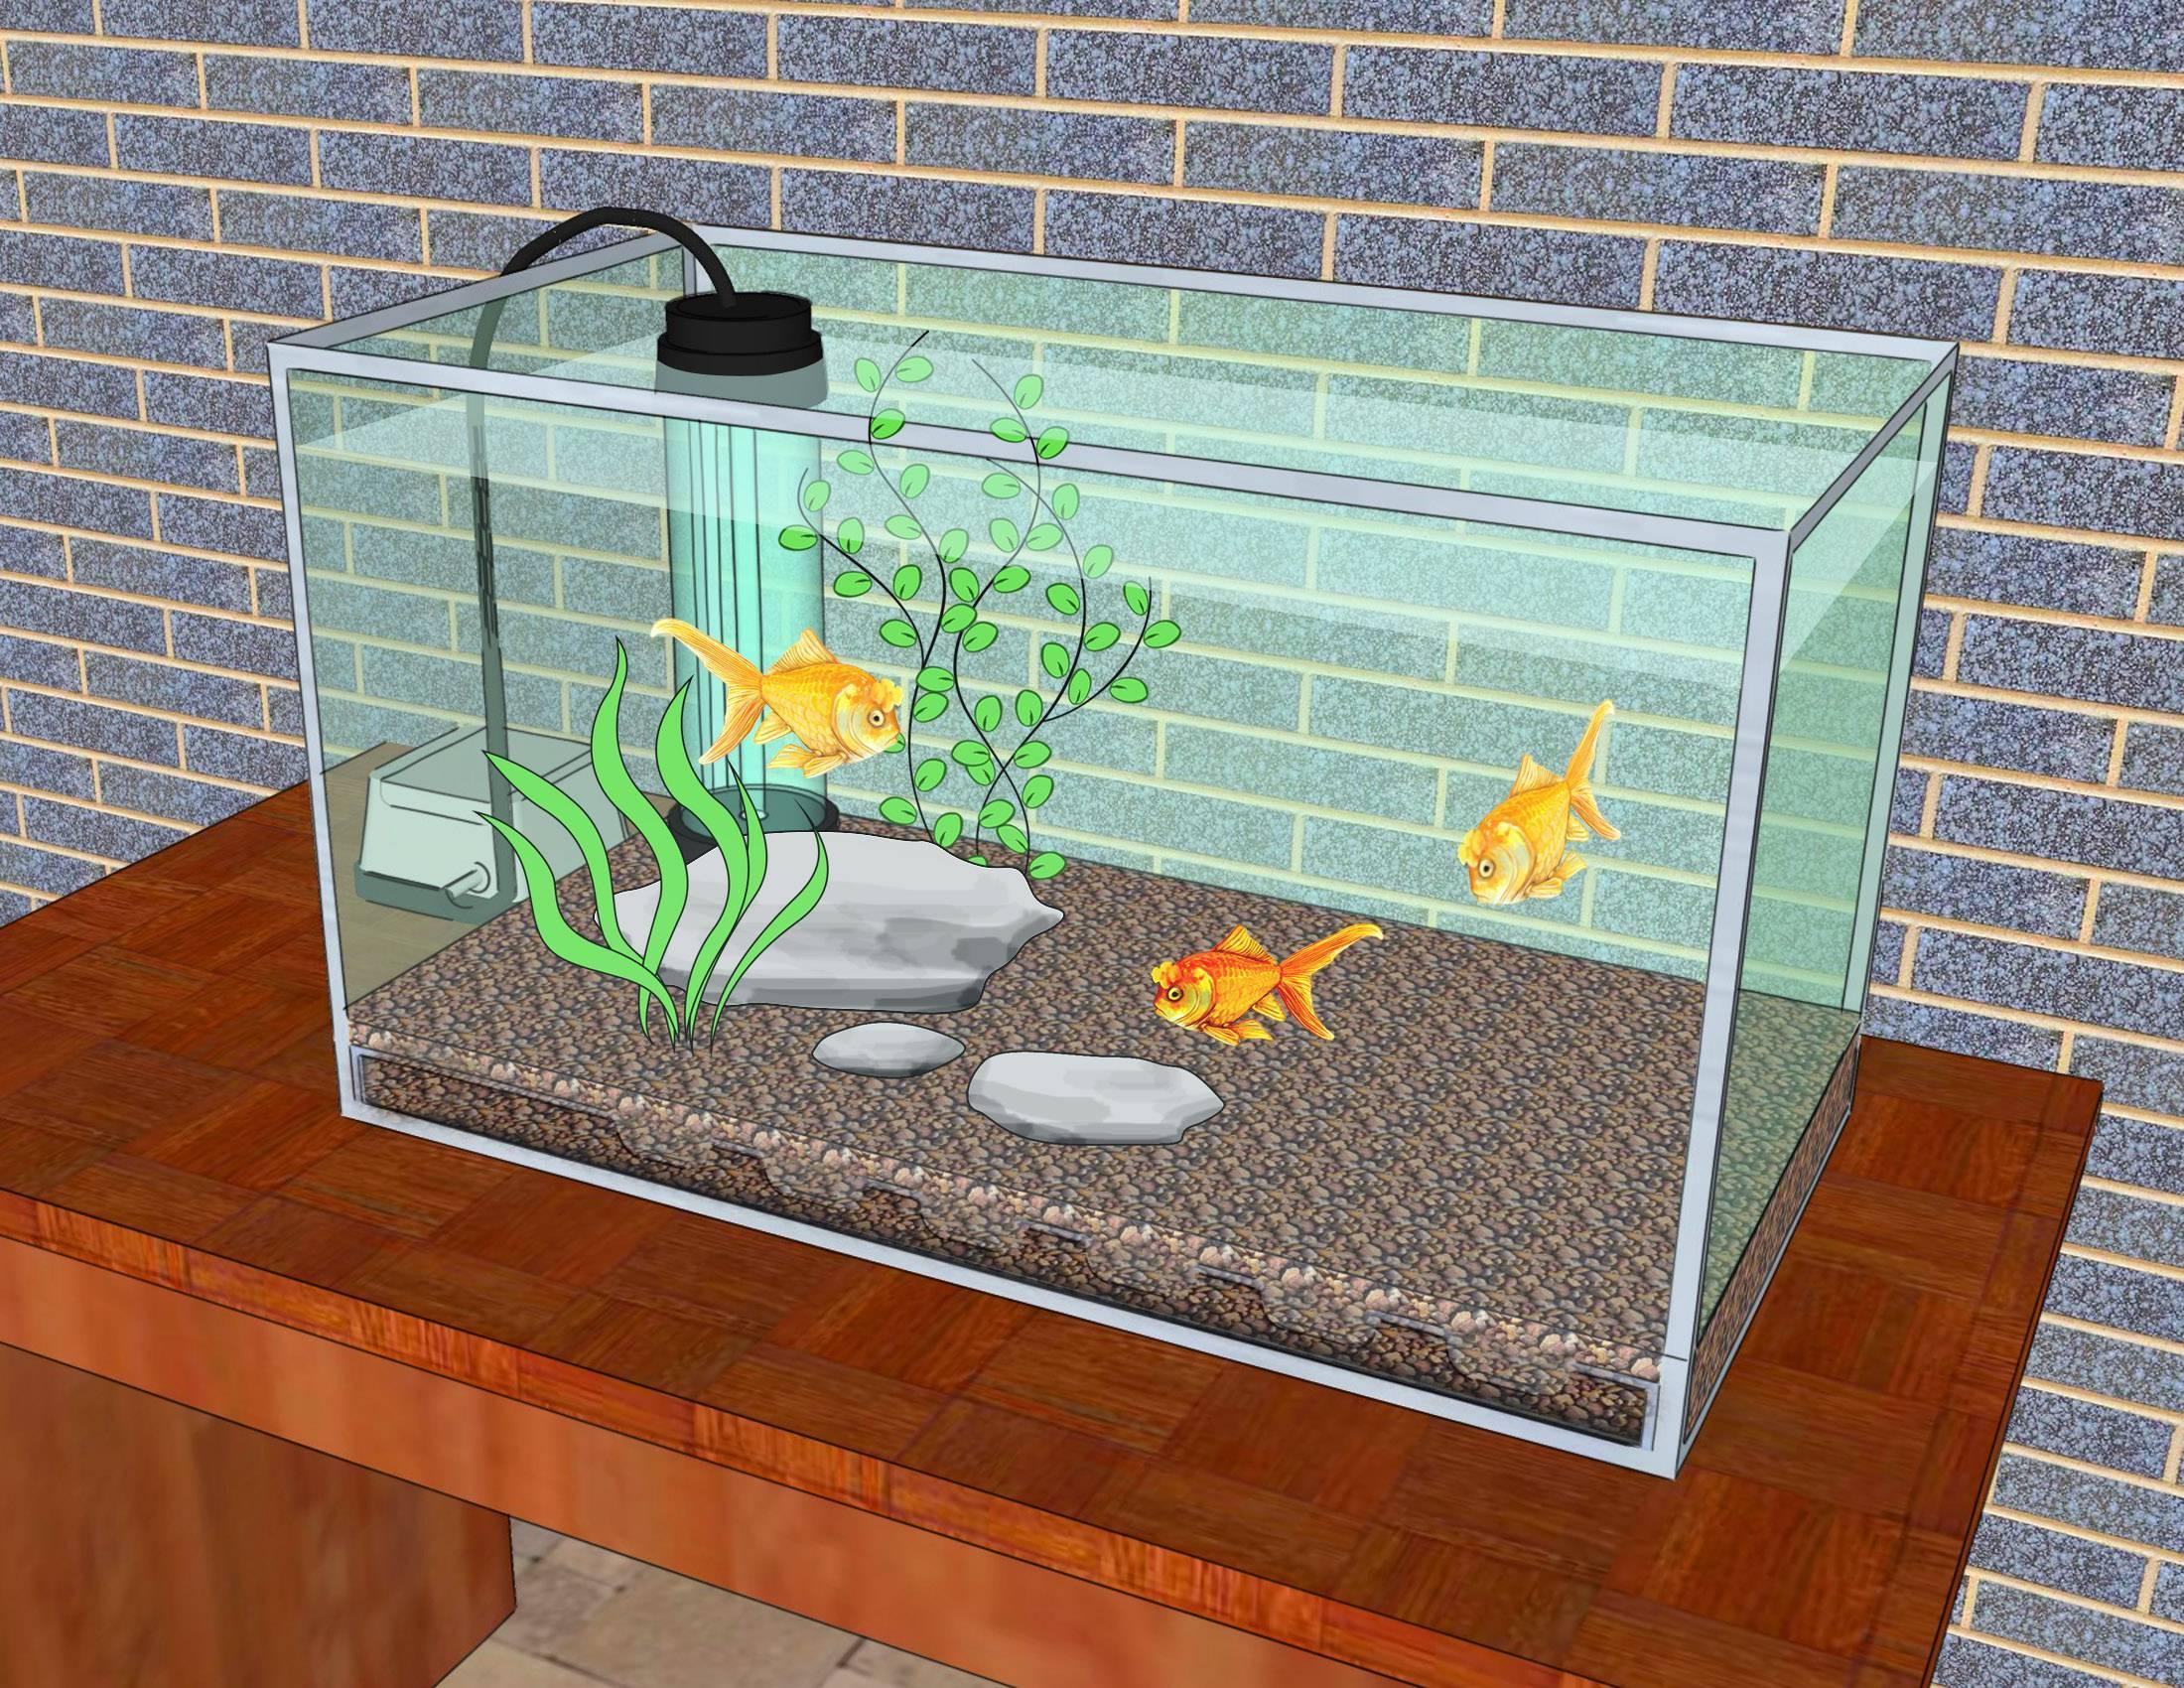 Почему рыбки умирают в аквариуме? аквариум для начинающих